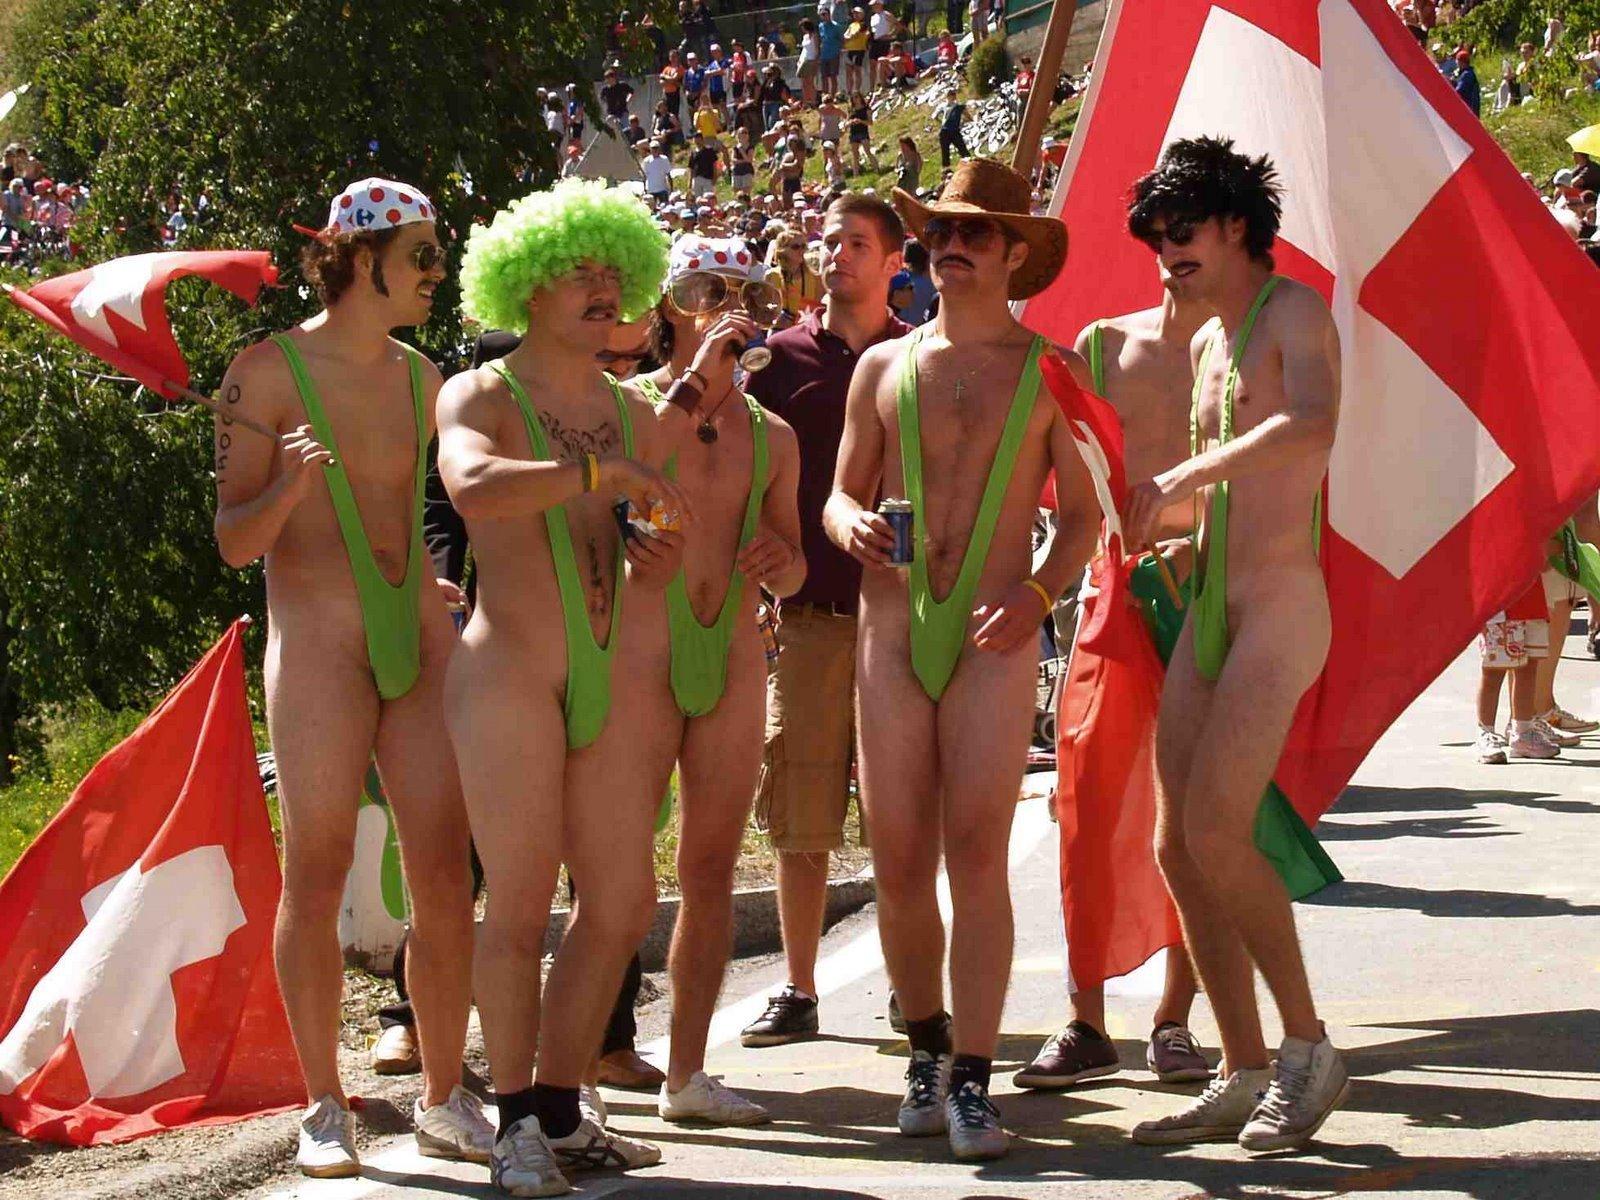 Naked girl at tour de france